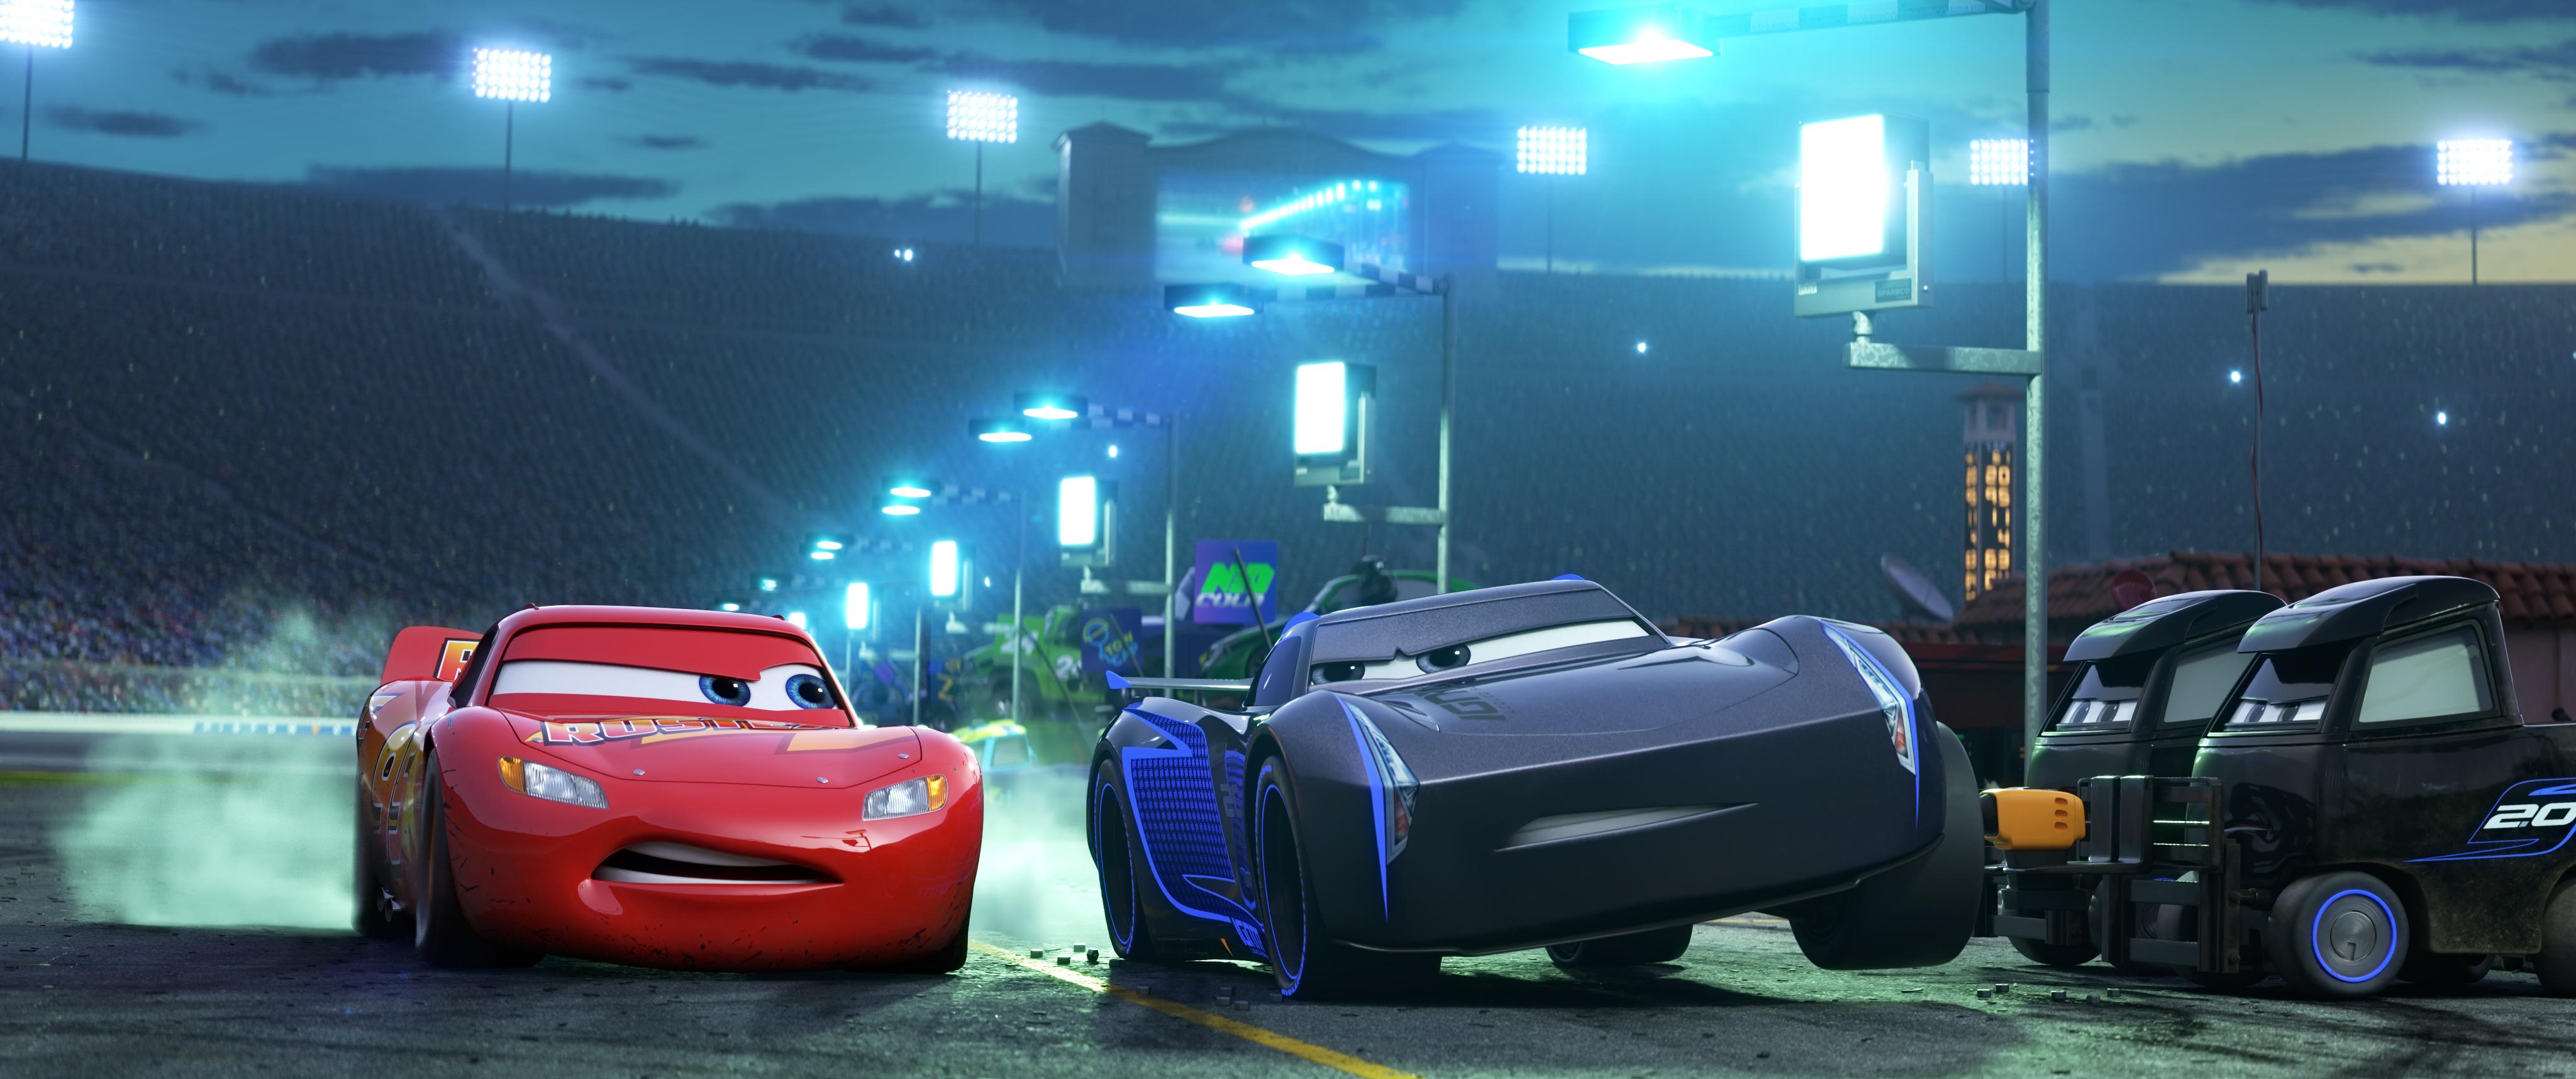 Blu Ray Cars